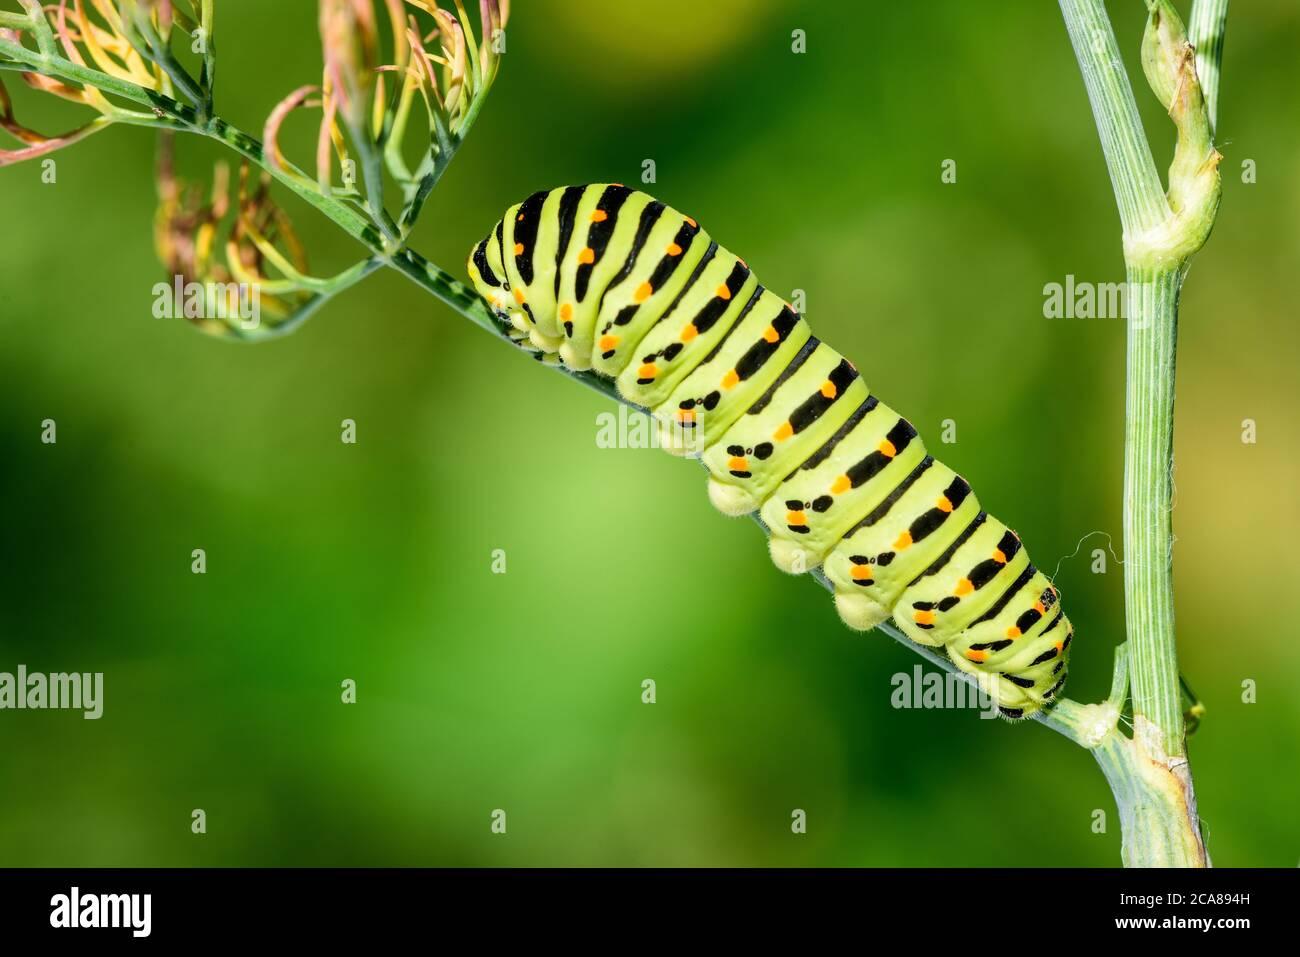 Swallowtail caterpillar (Papilio machaon). Swallowtail caterpillar on dill plant, on natural background. Stock Photo